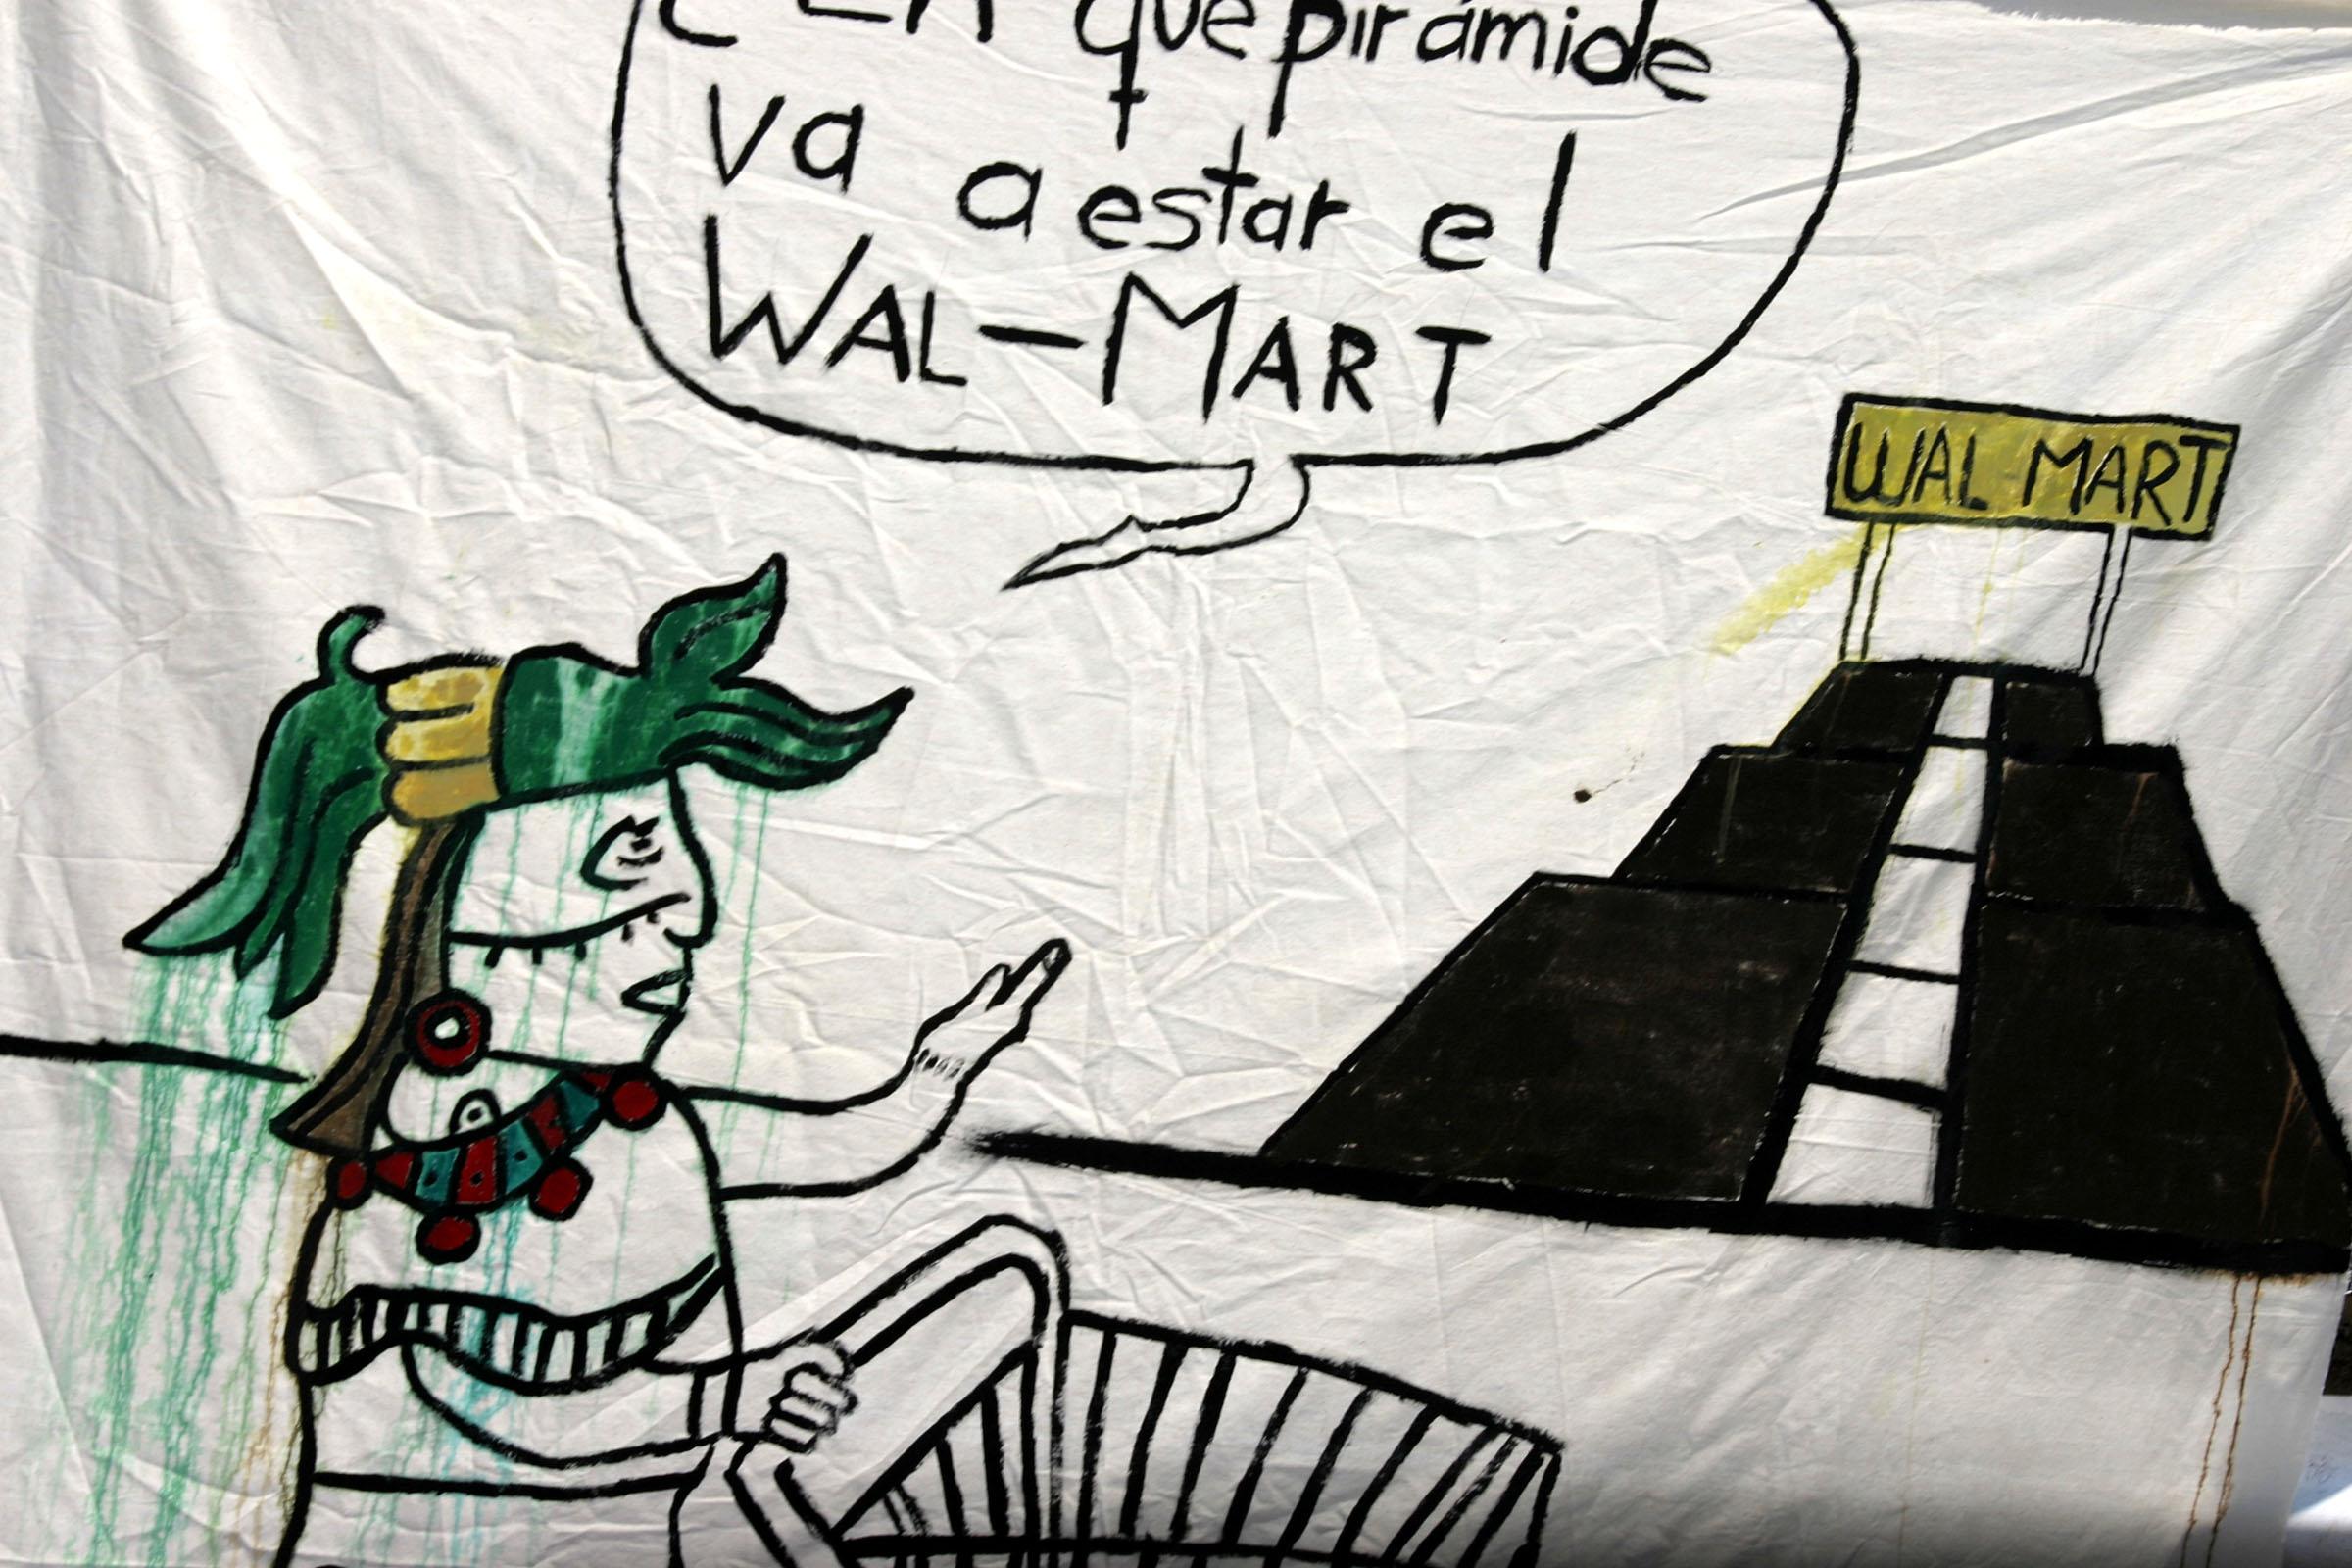 Teotihuacan-Walmart, KRT